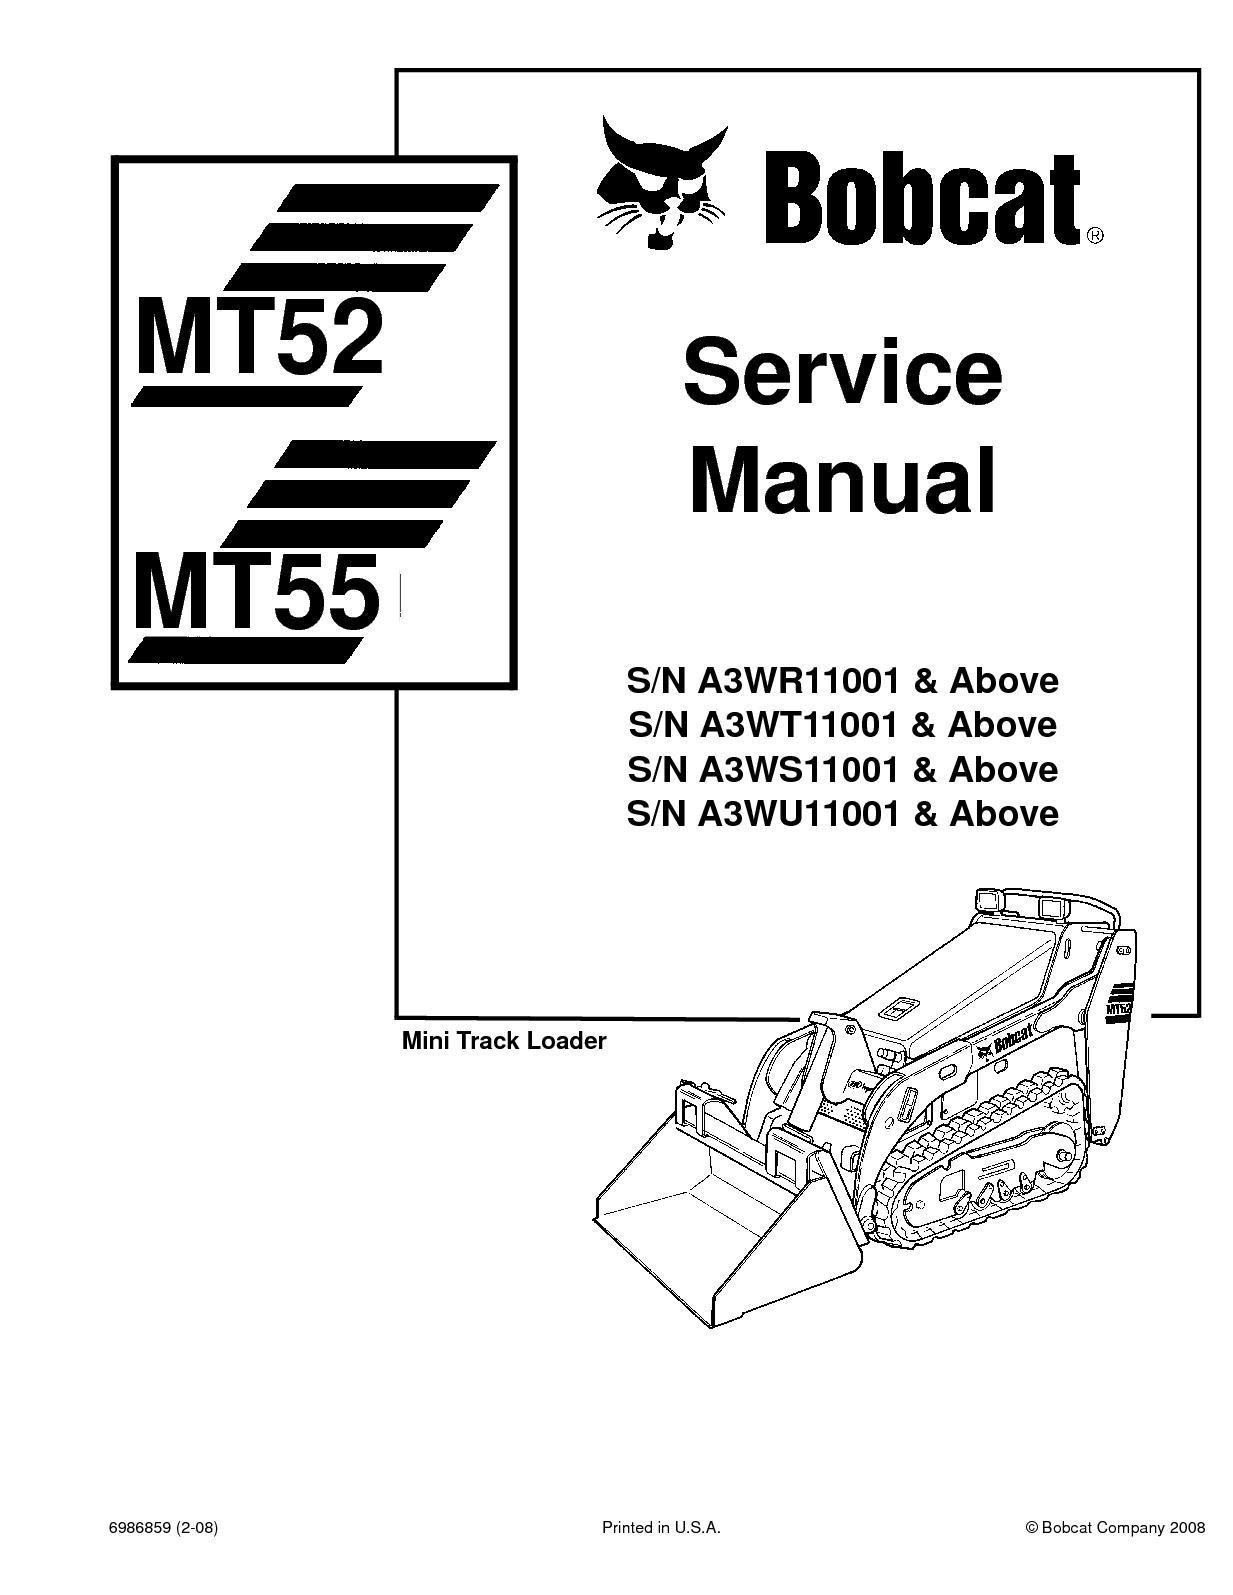 bobcat mt55 compact track loader service repair manual sn a3wr11001 & above